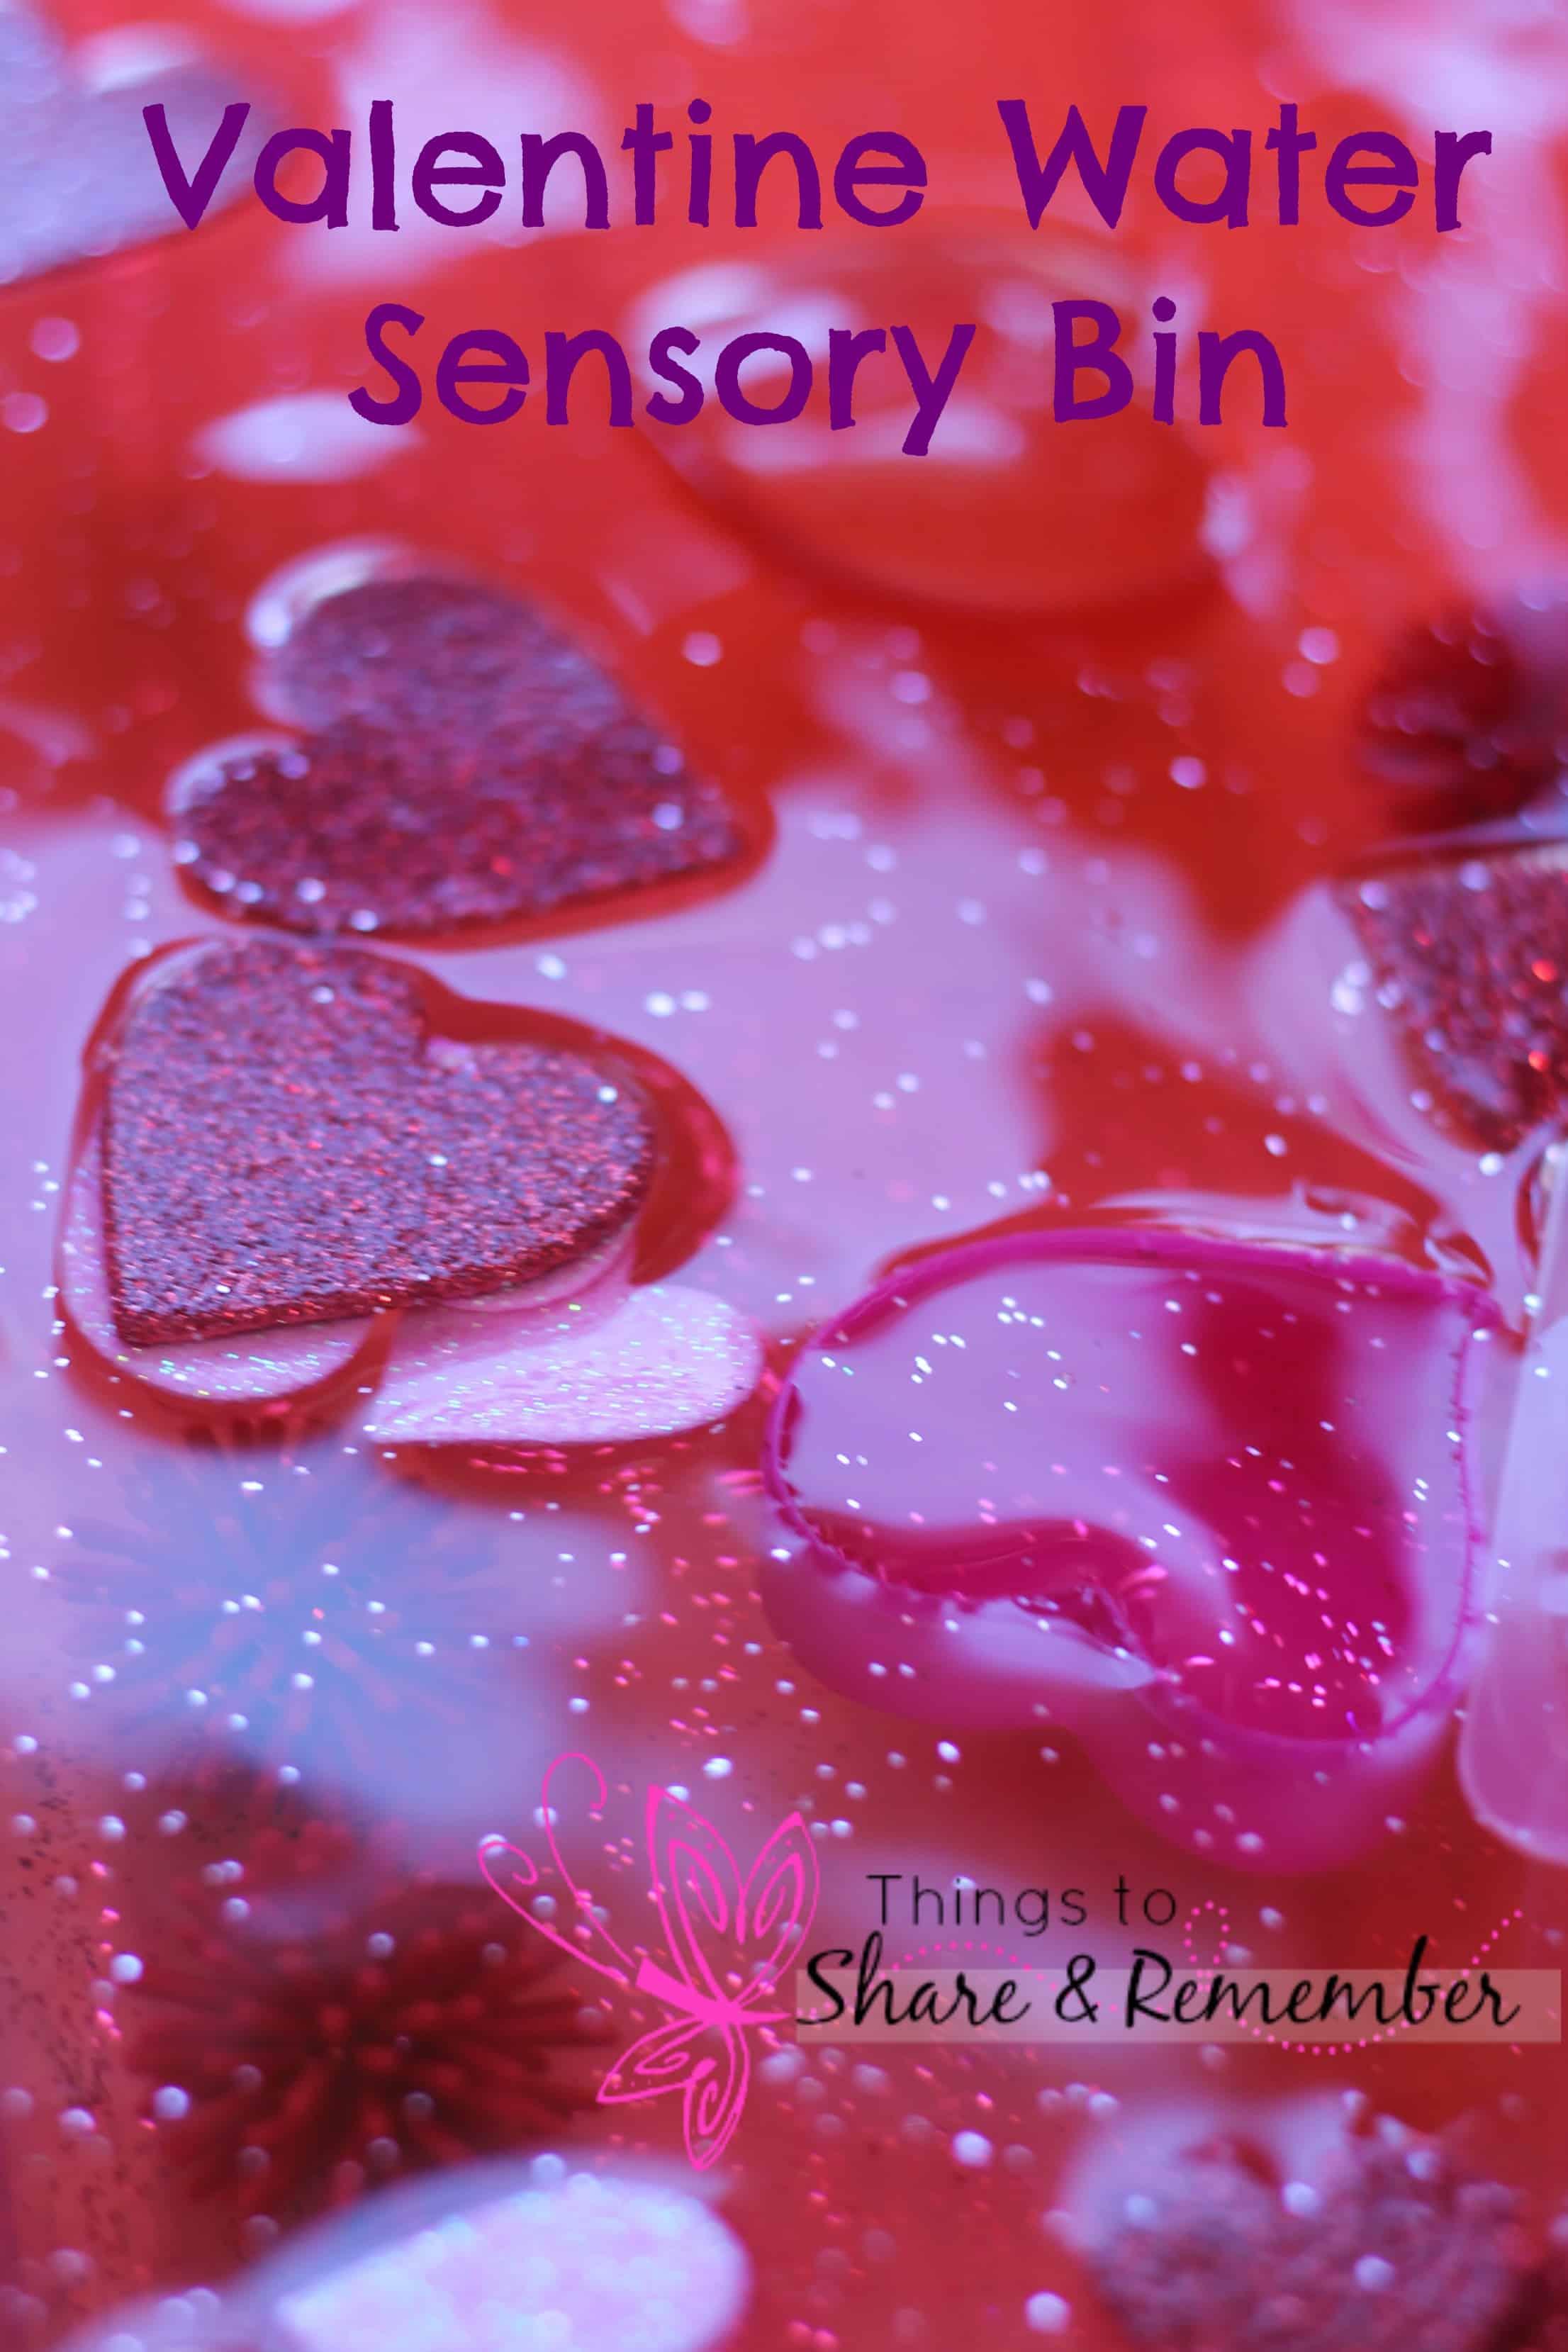 Valentine Water Sensory Play